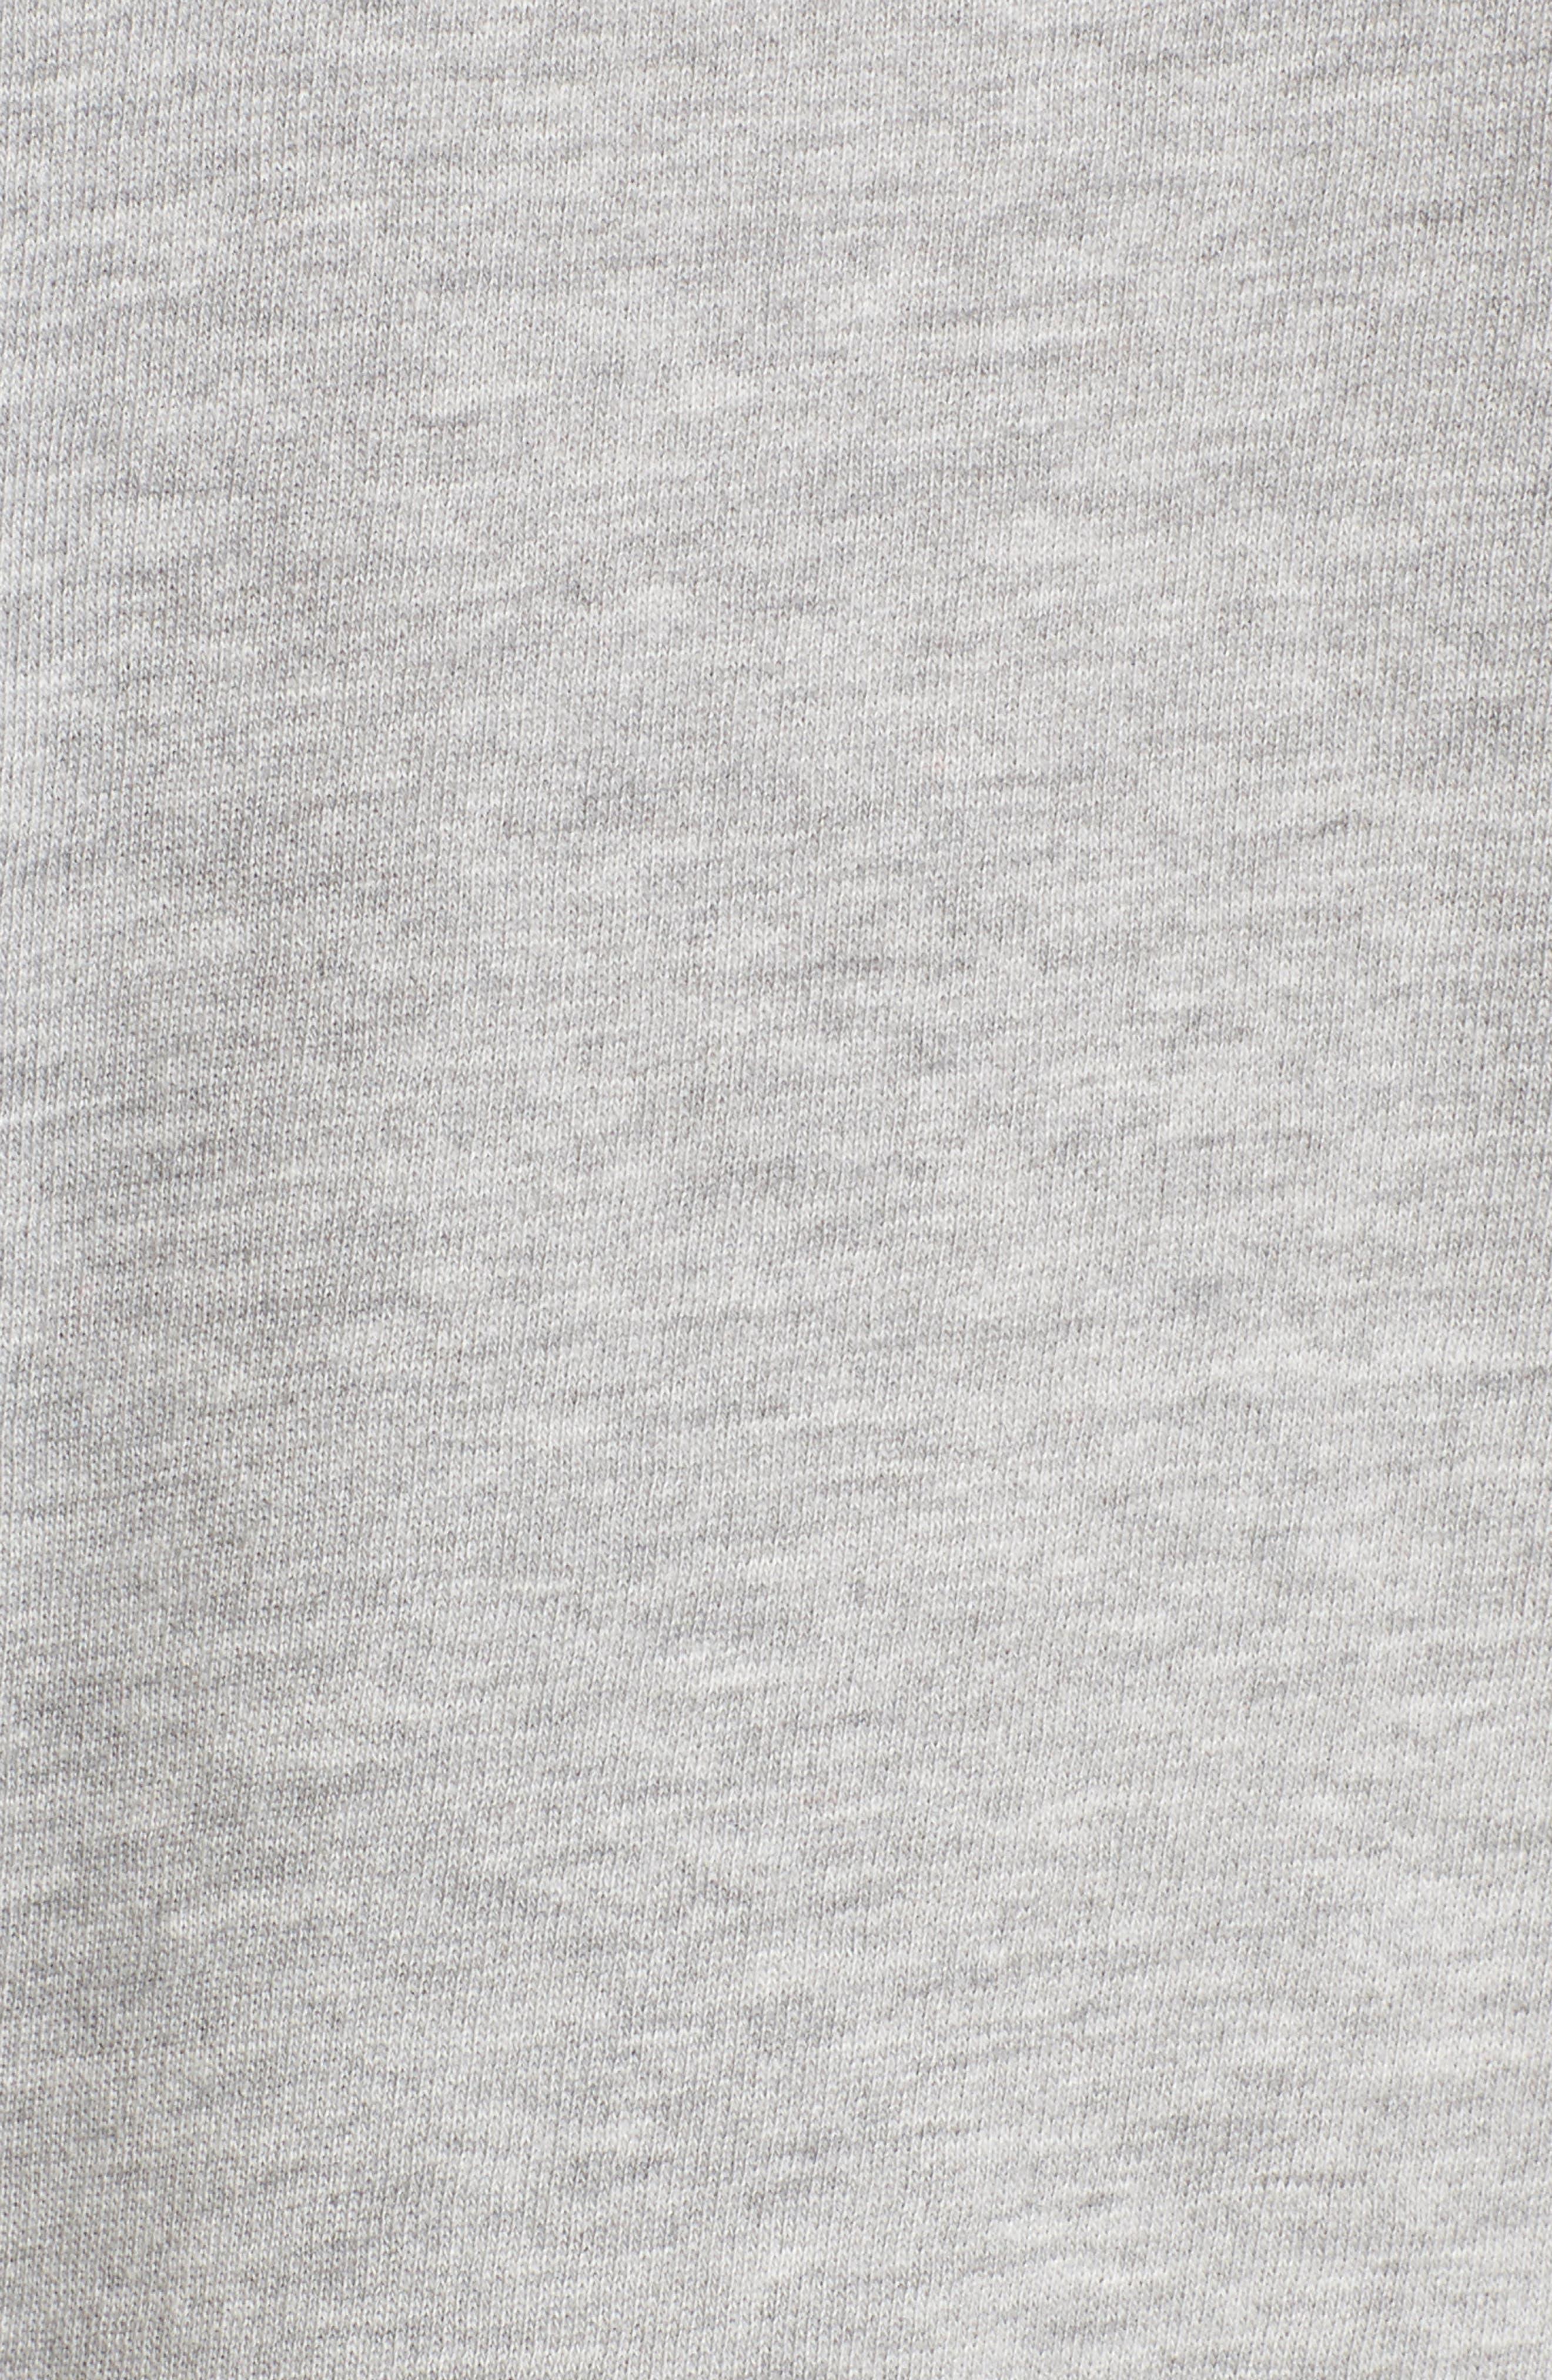 Lace-Up Side Sweatshirt,                             Alternate thumbnail 5, color,                             030